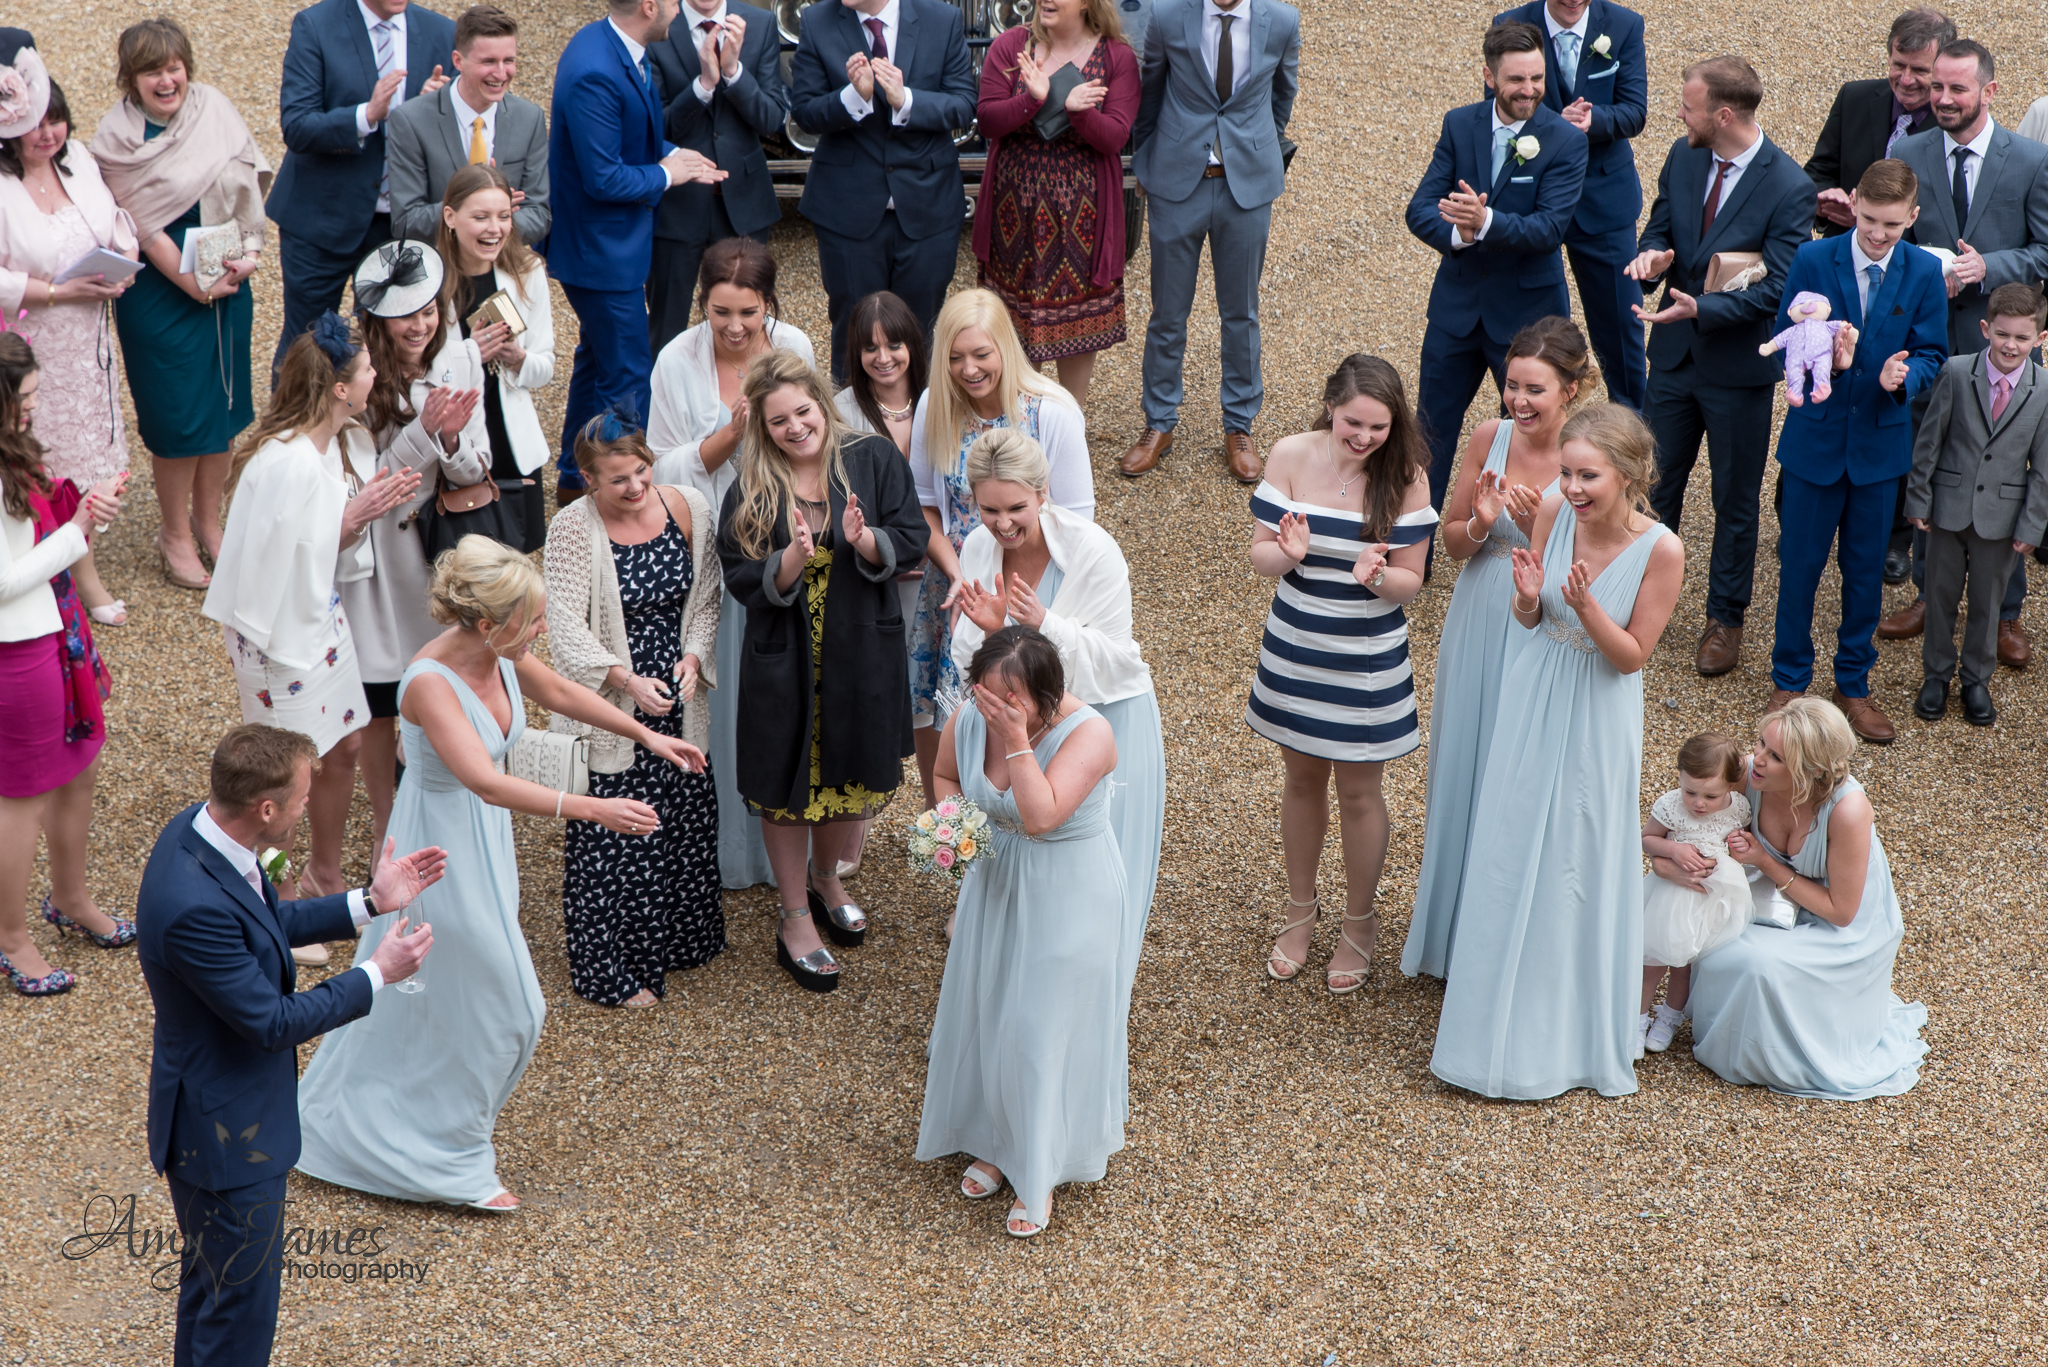 Hampshire wedding photographer // Fleet weding photographer // Warbrook House wedding Photographer // Aldershot Garrison wedding